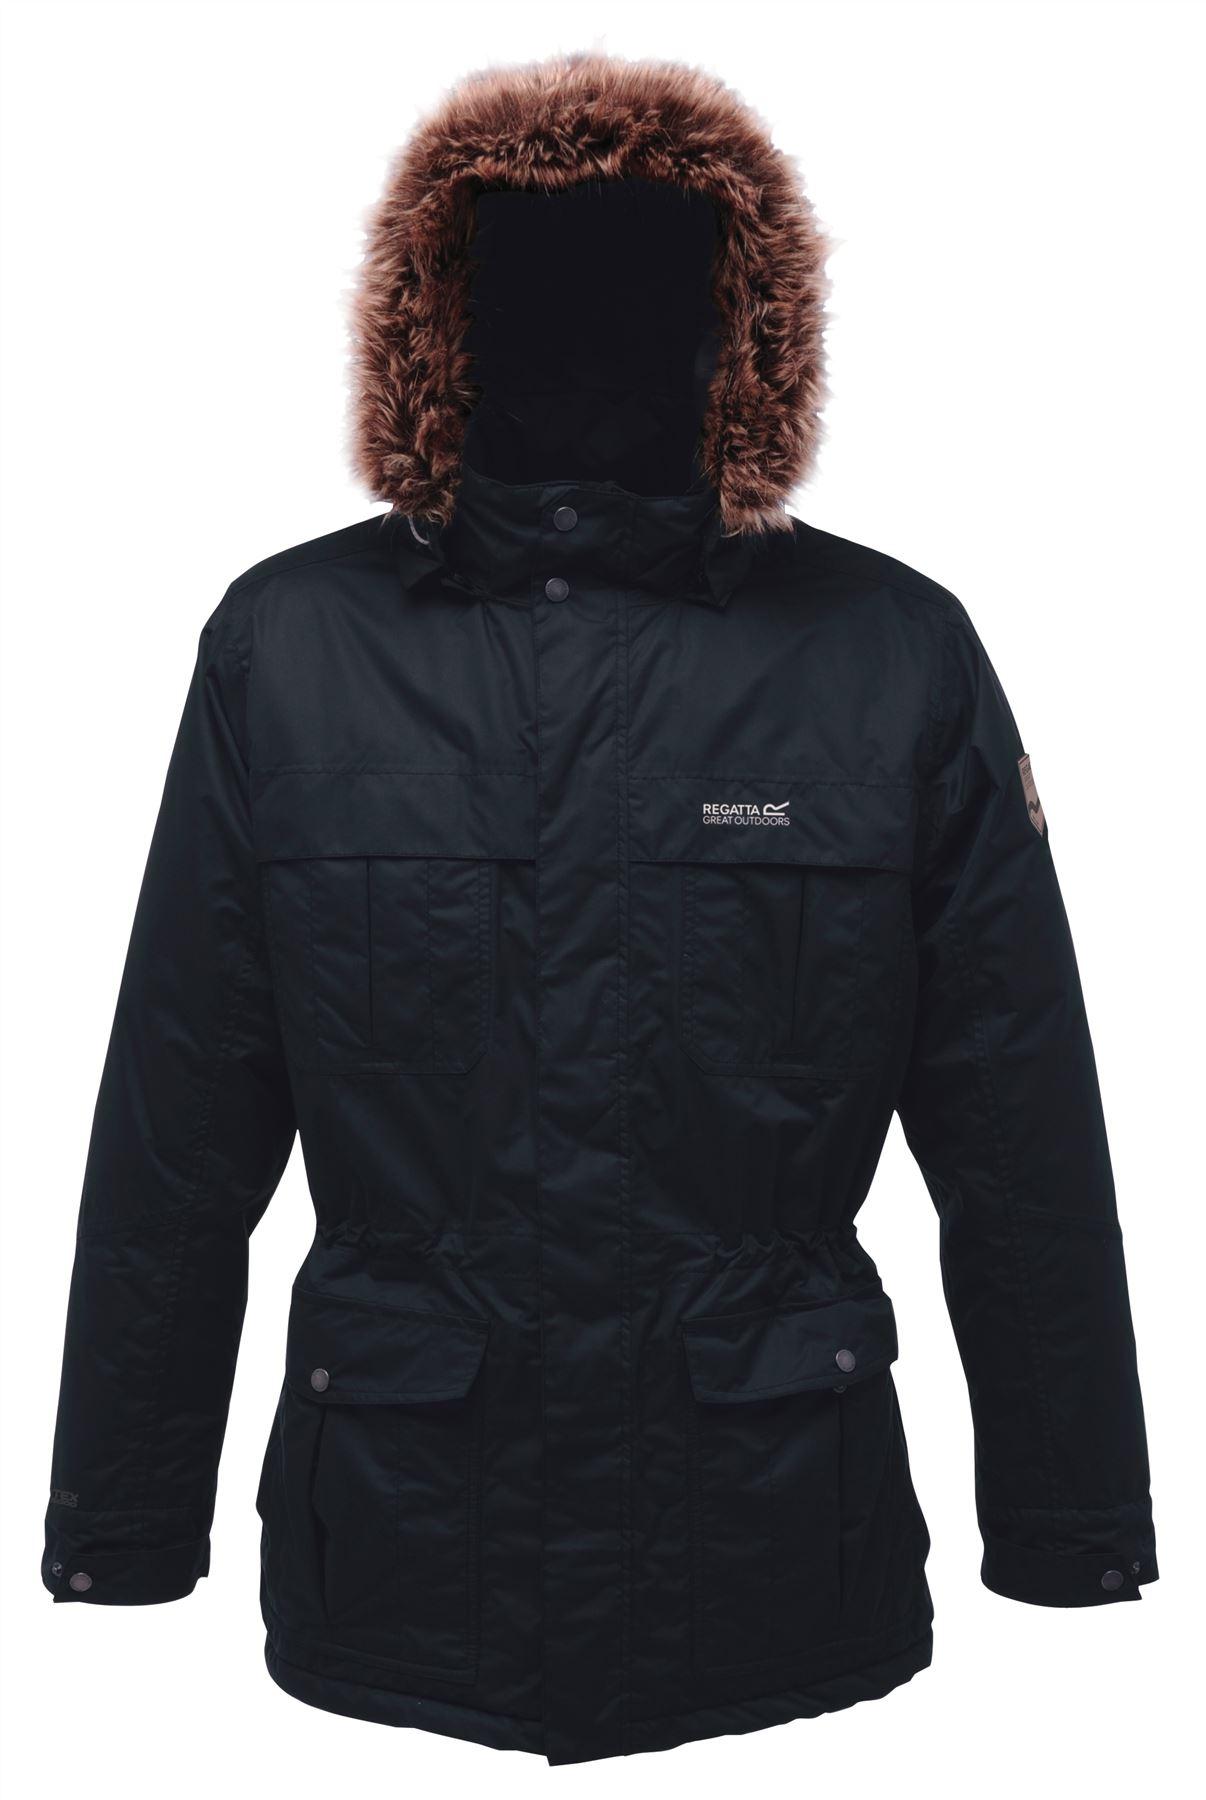 Regatta Landbreak Mens Parka Waterproof Breathable Insulated Winter Jacket